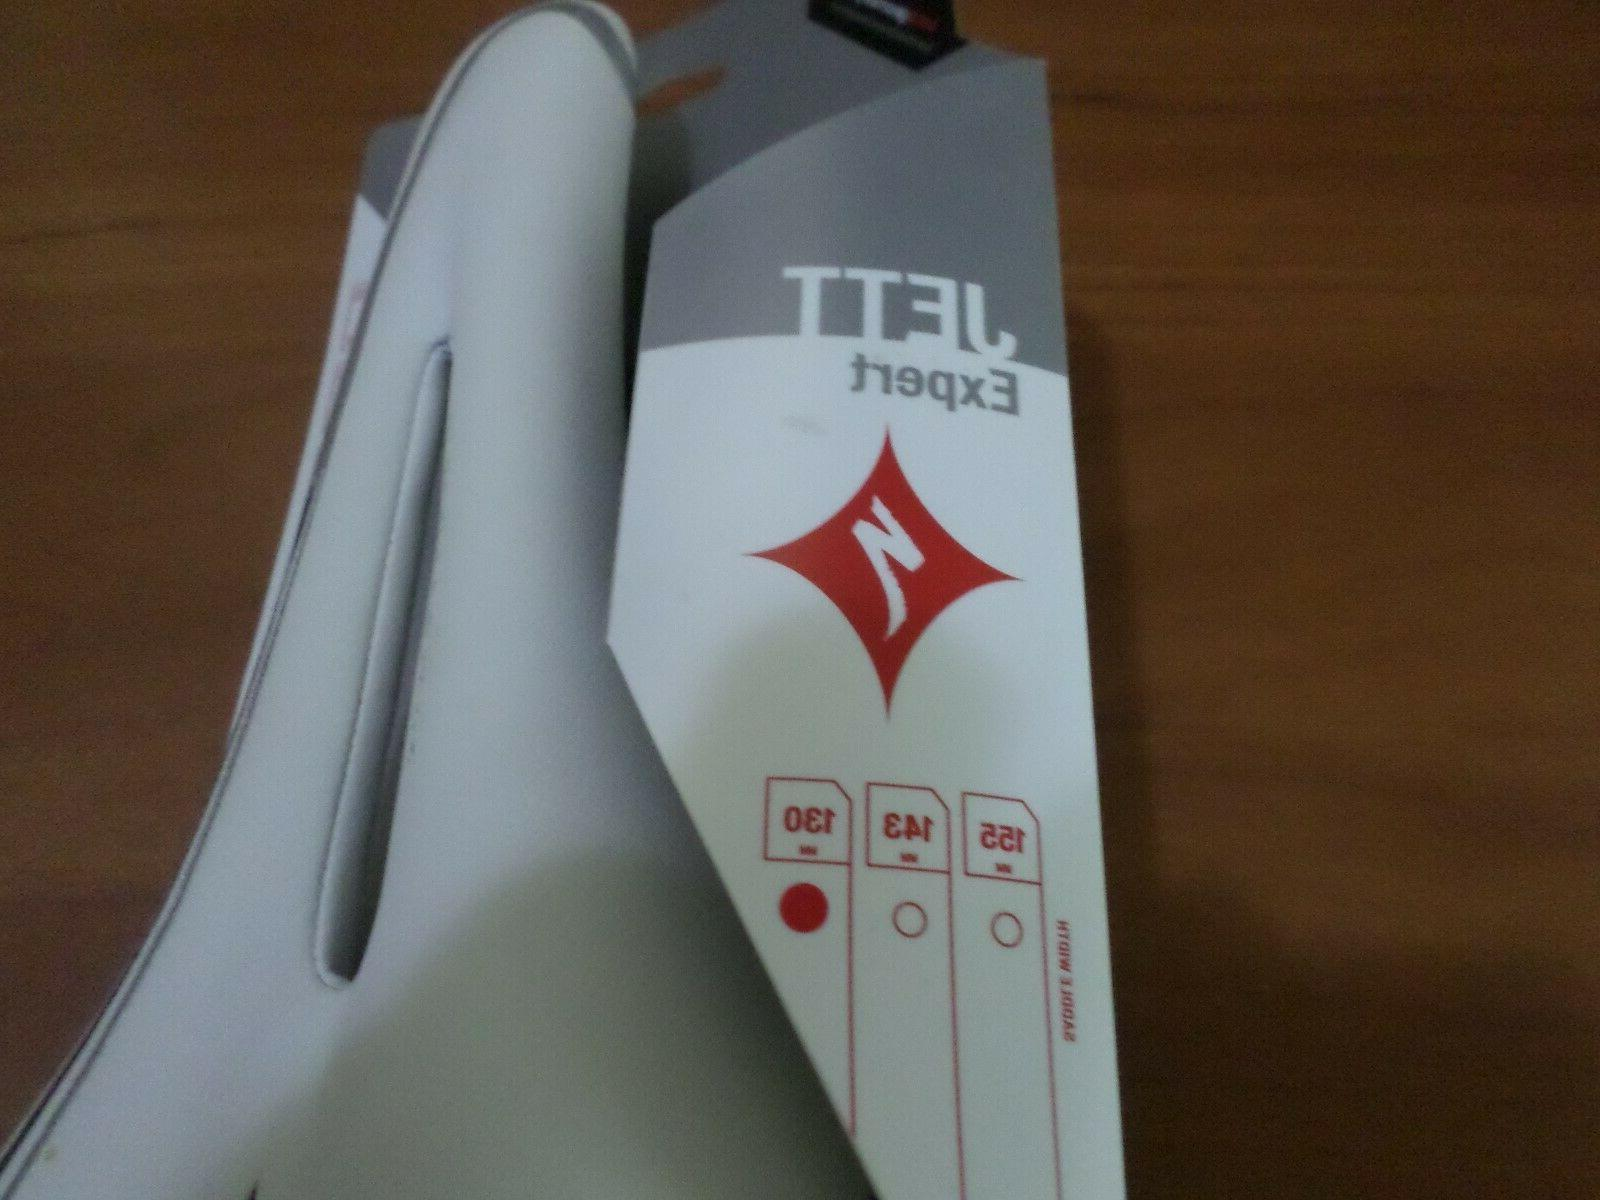 NEW 130mm Jett Expert Ti Saddle Road Ruby